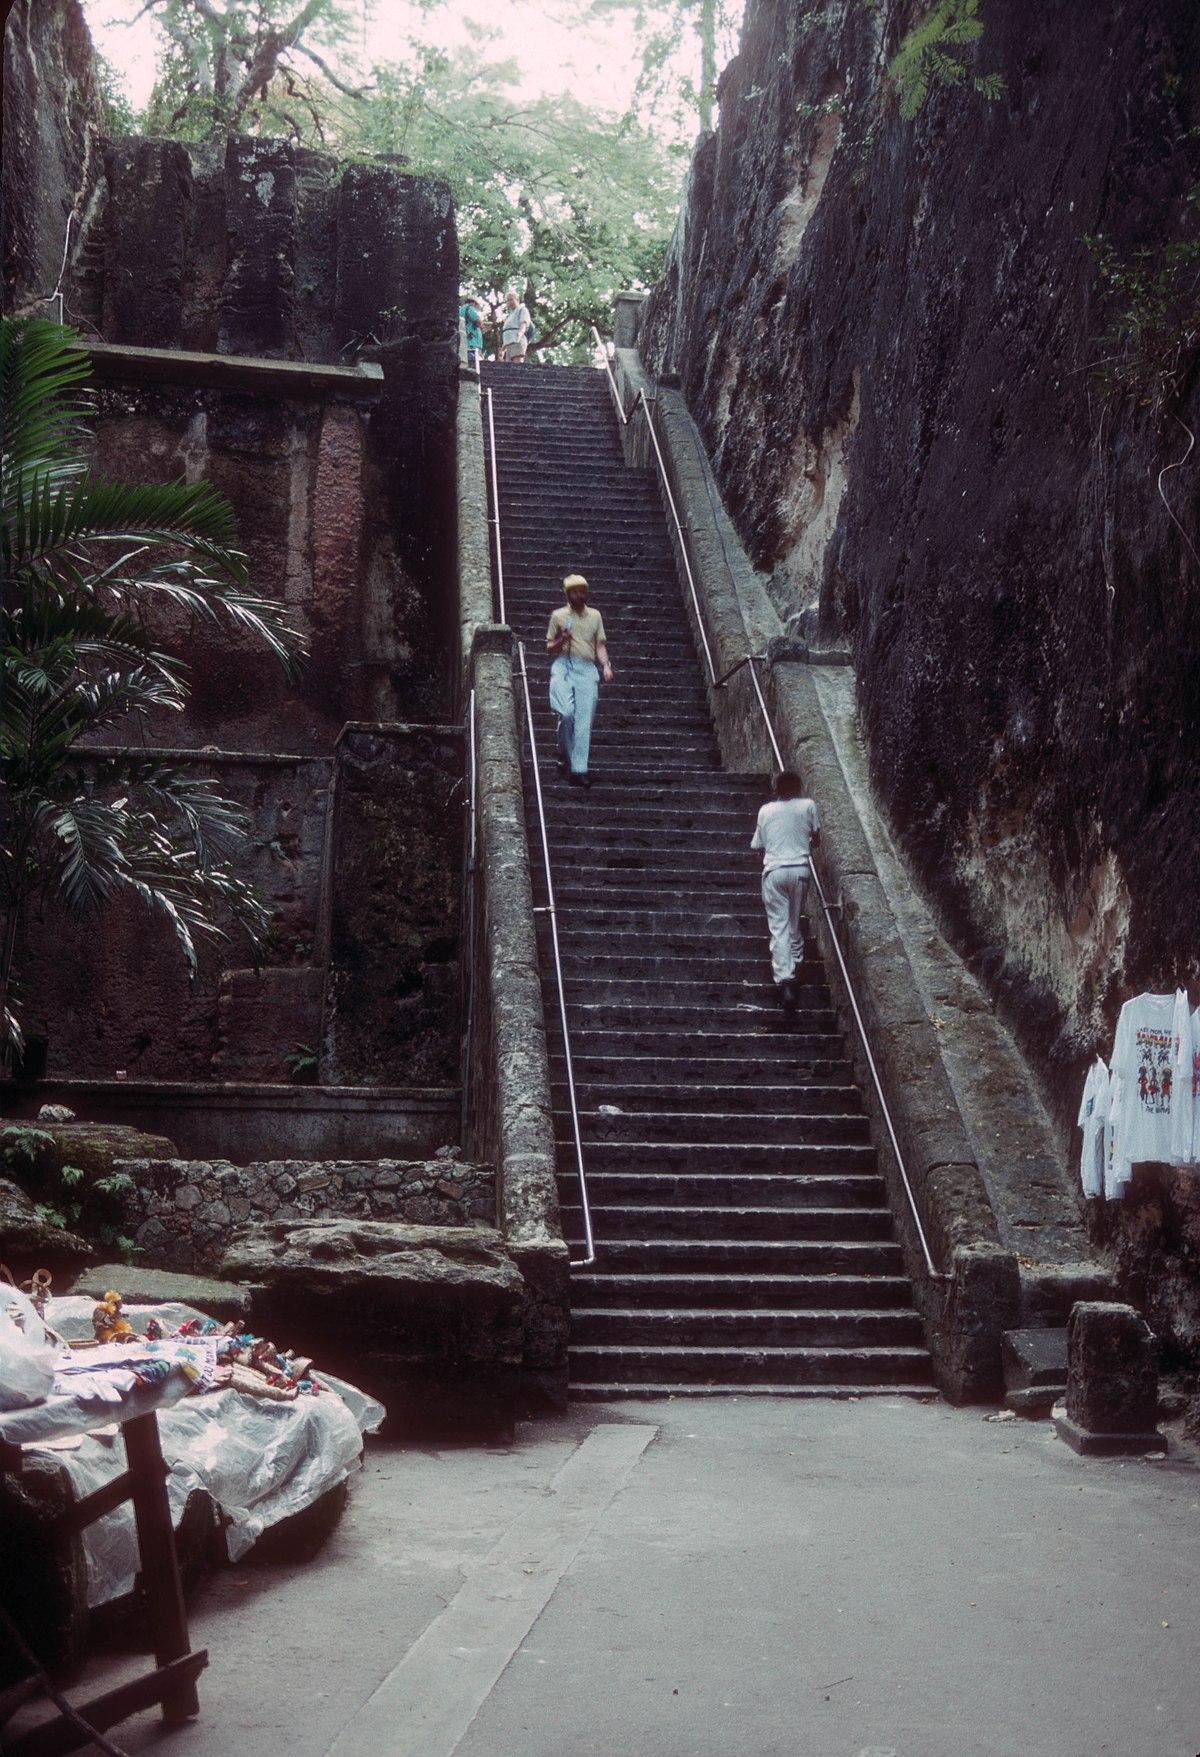 Queen S Staircase Nassau Wikipedia